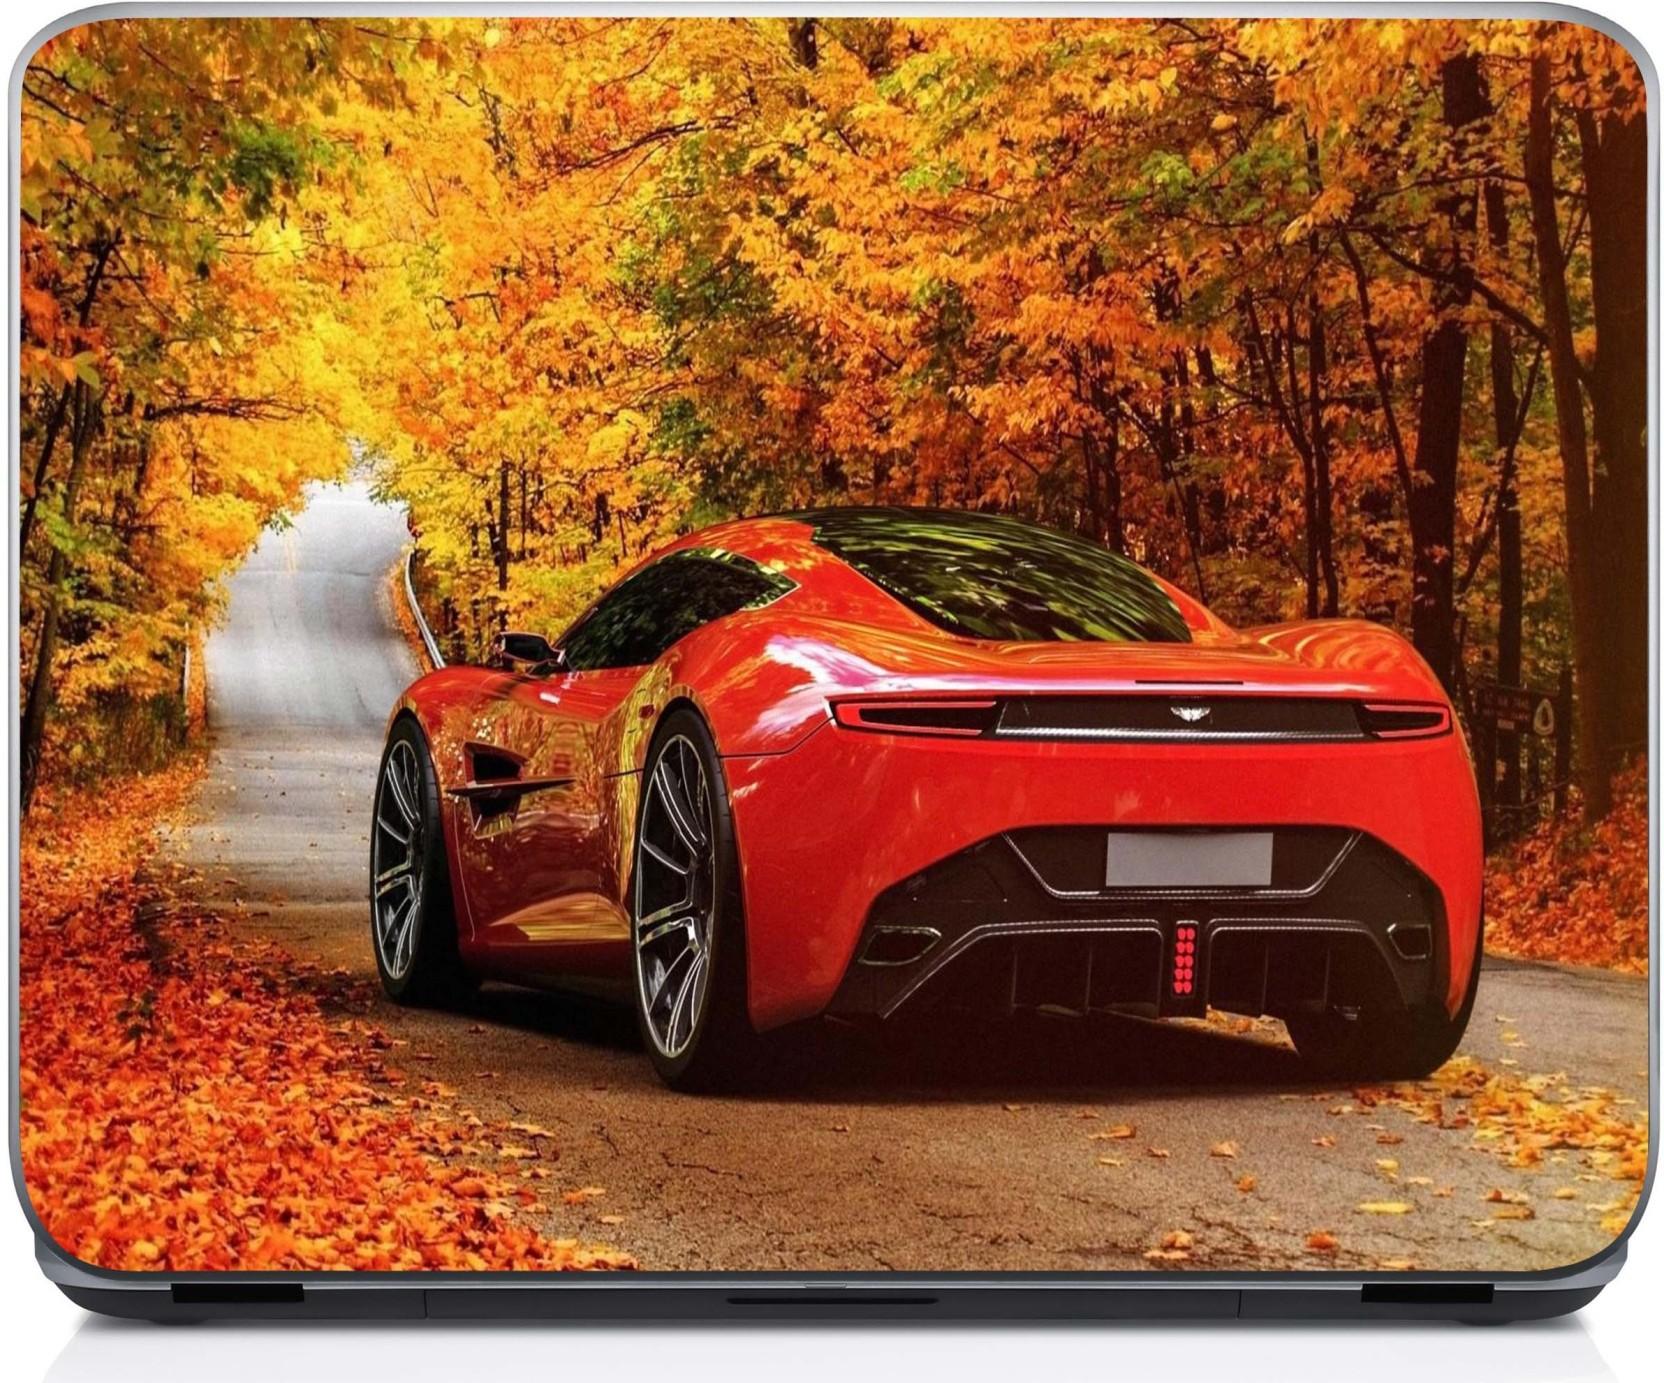 Holicshop Aston Martin Dbc Concept Cars Picturesque Car Pictures - Aston martin dbc price